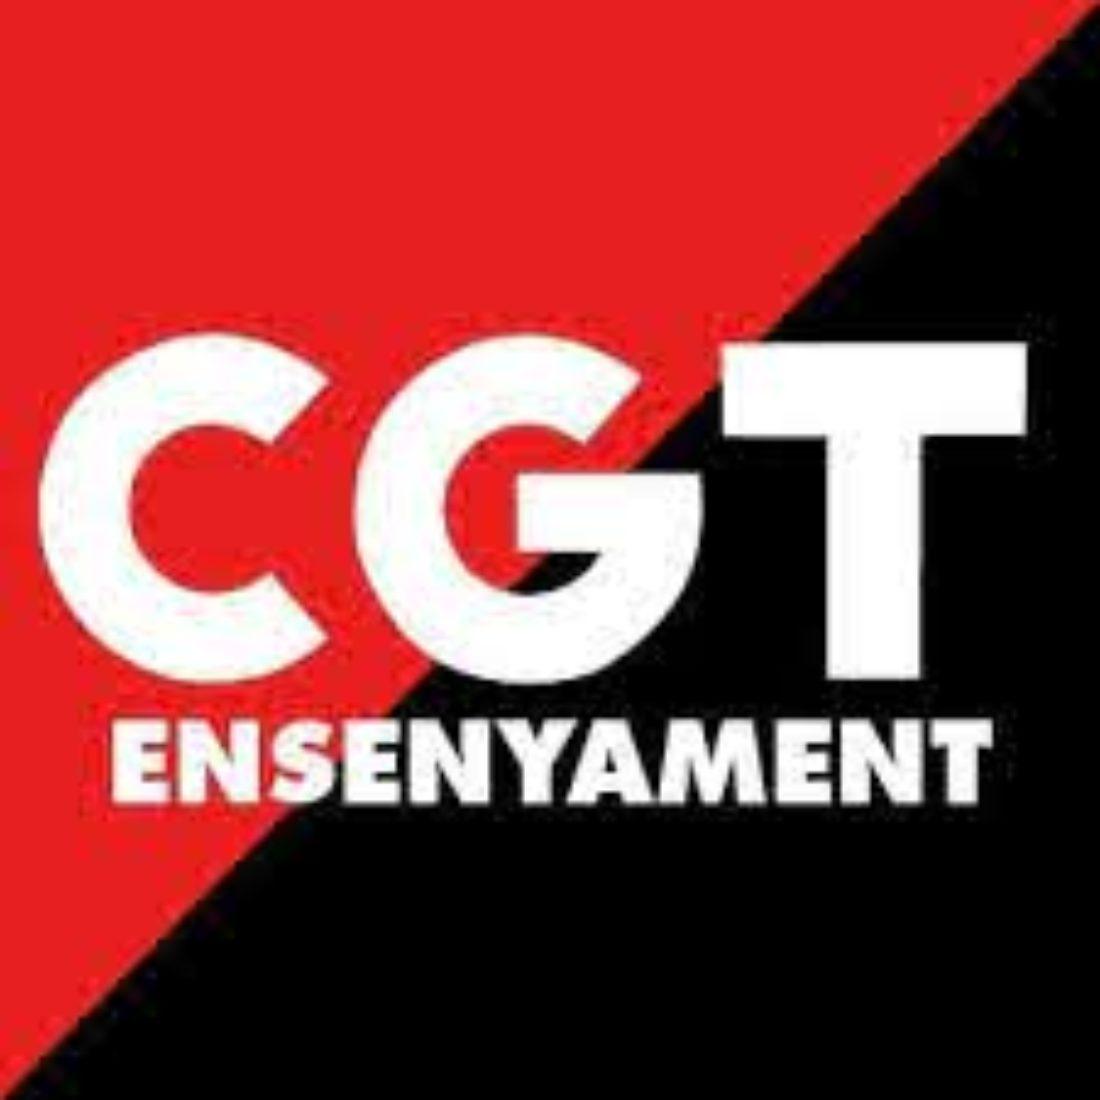 Nuevo Secretariado Permanente de la Federació d'Ensenyament de la CGT Catalunya